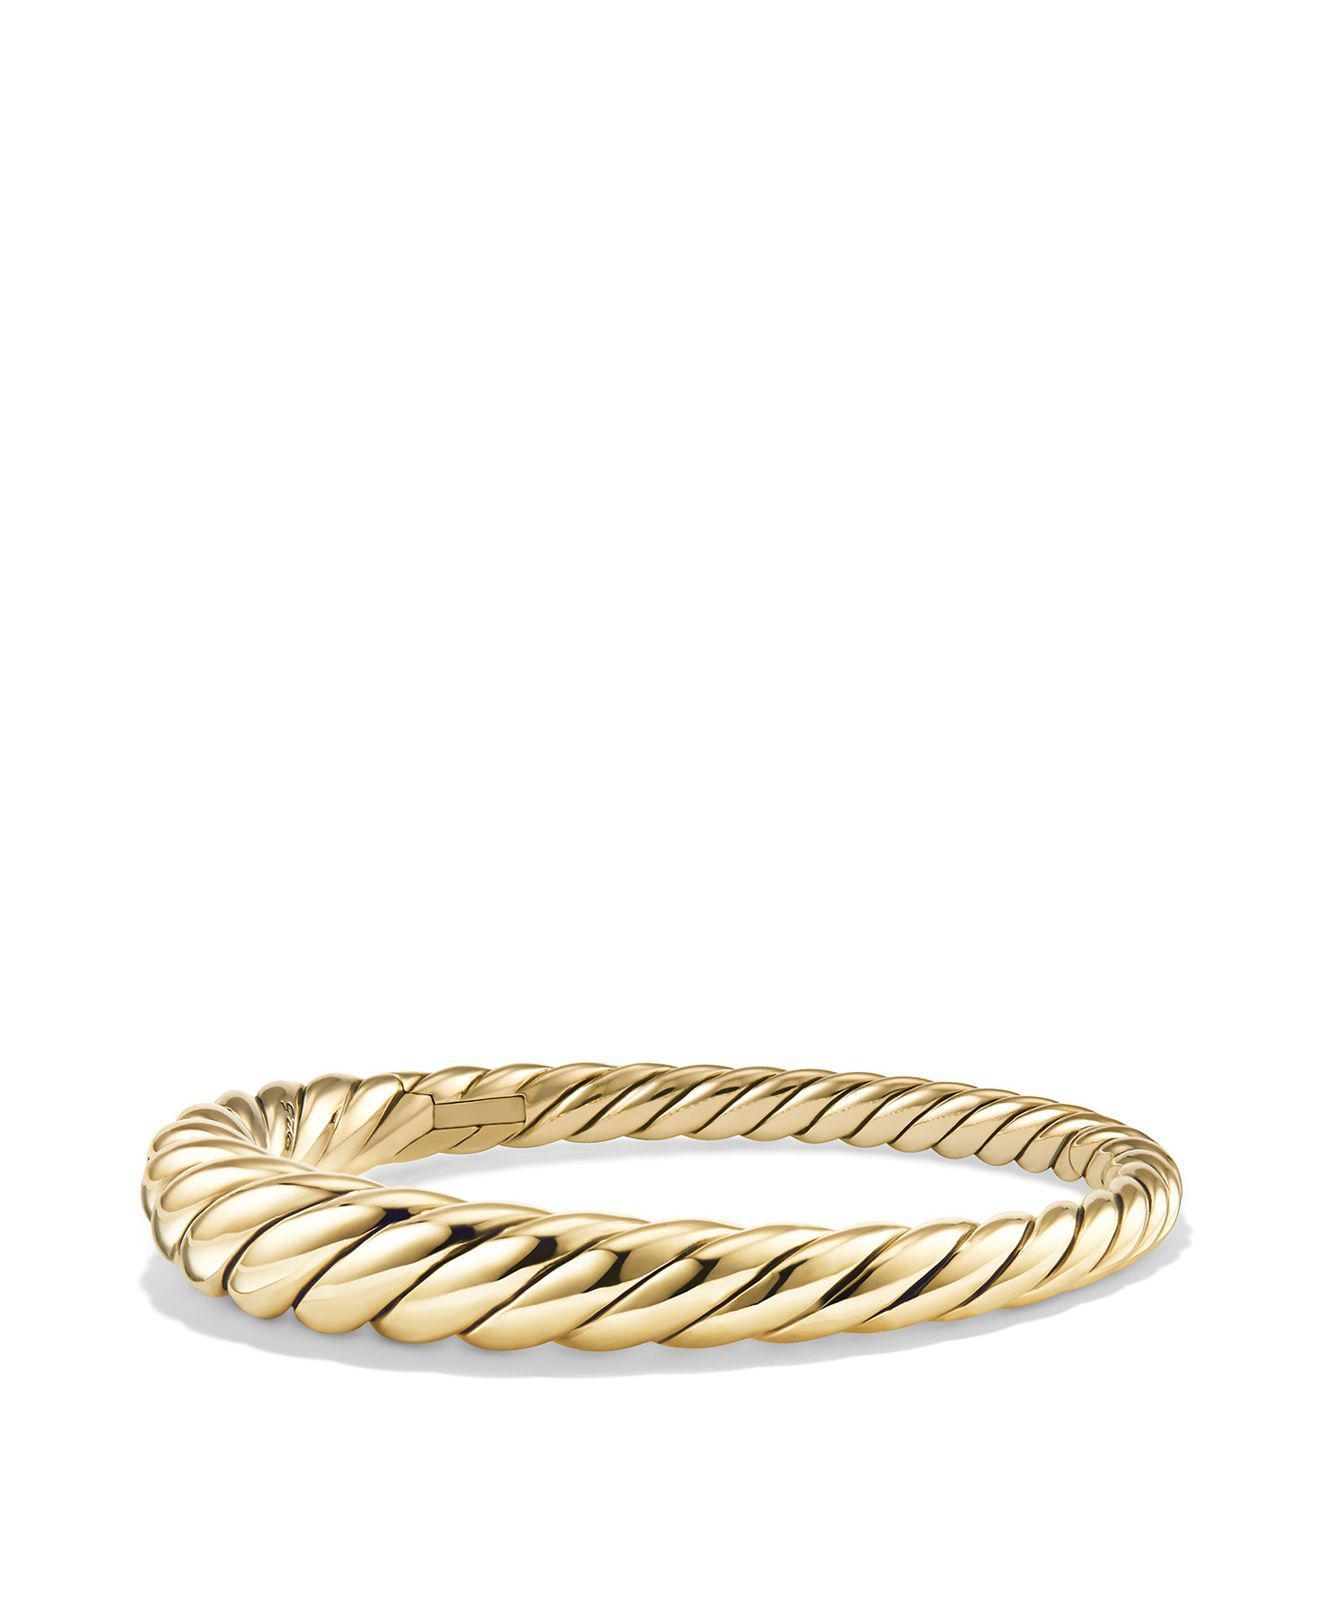 David Yurman Pure Form Cable bangle - Metallic B1sI2